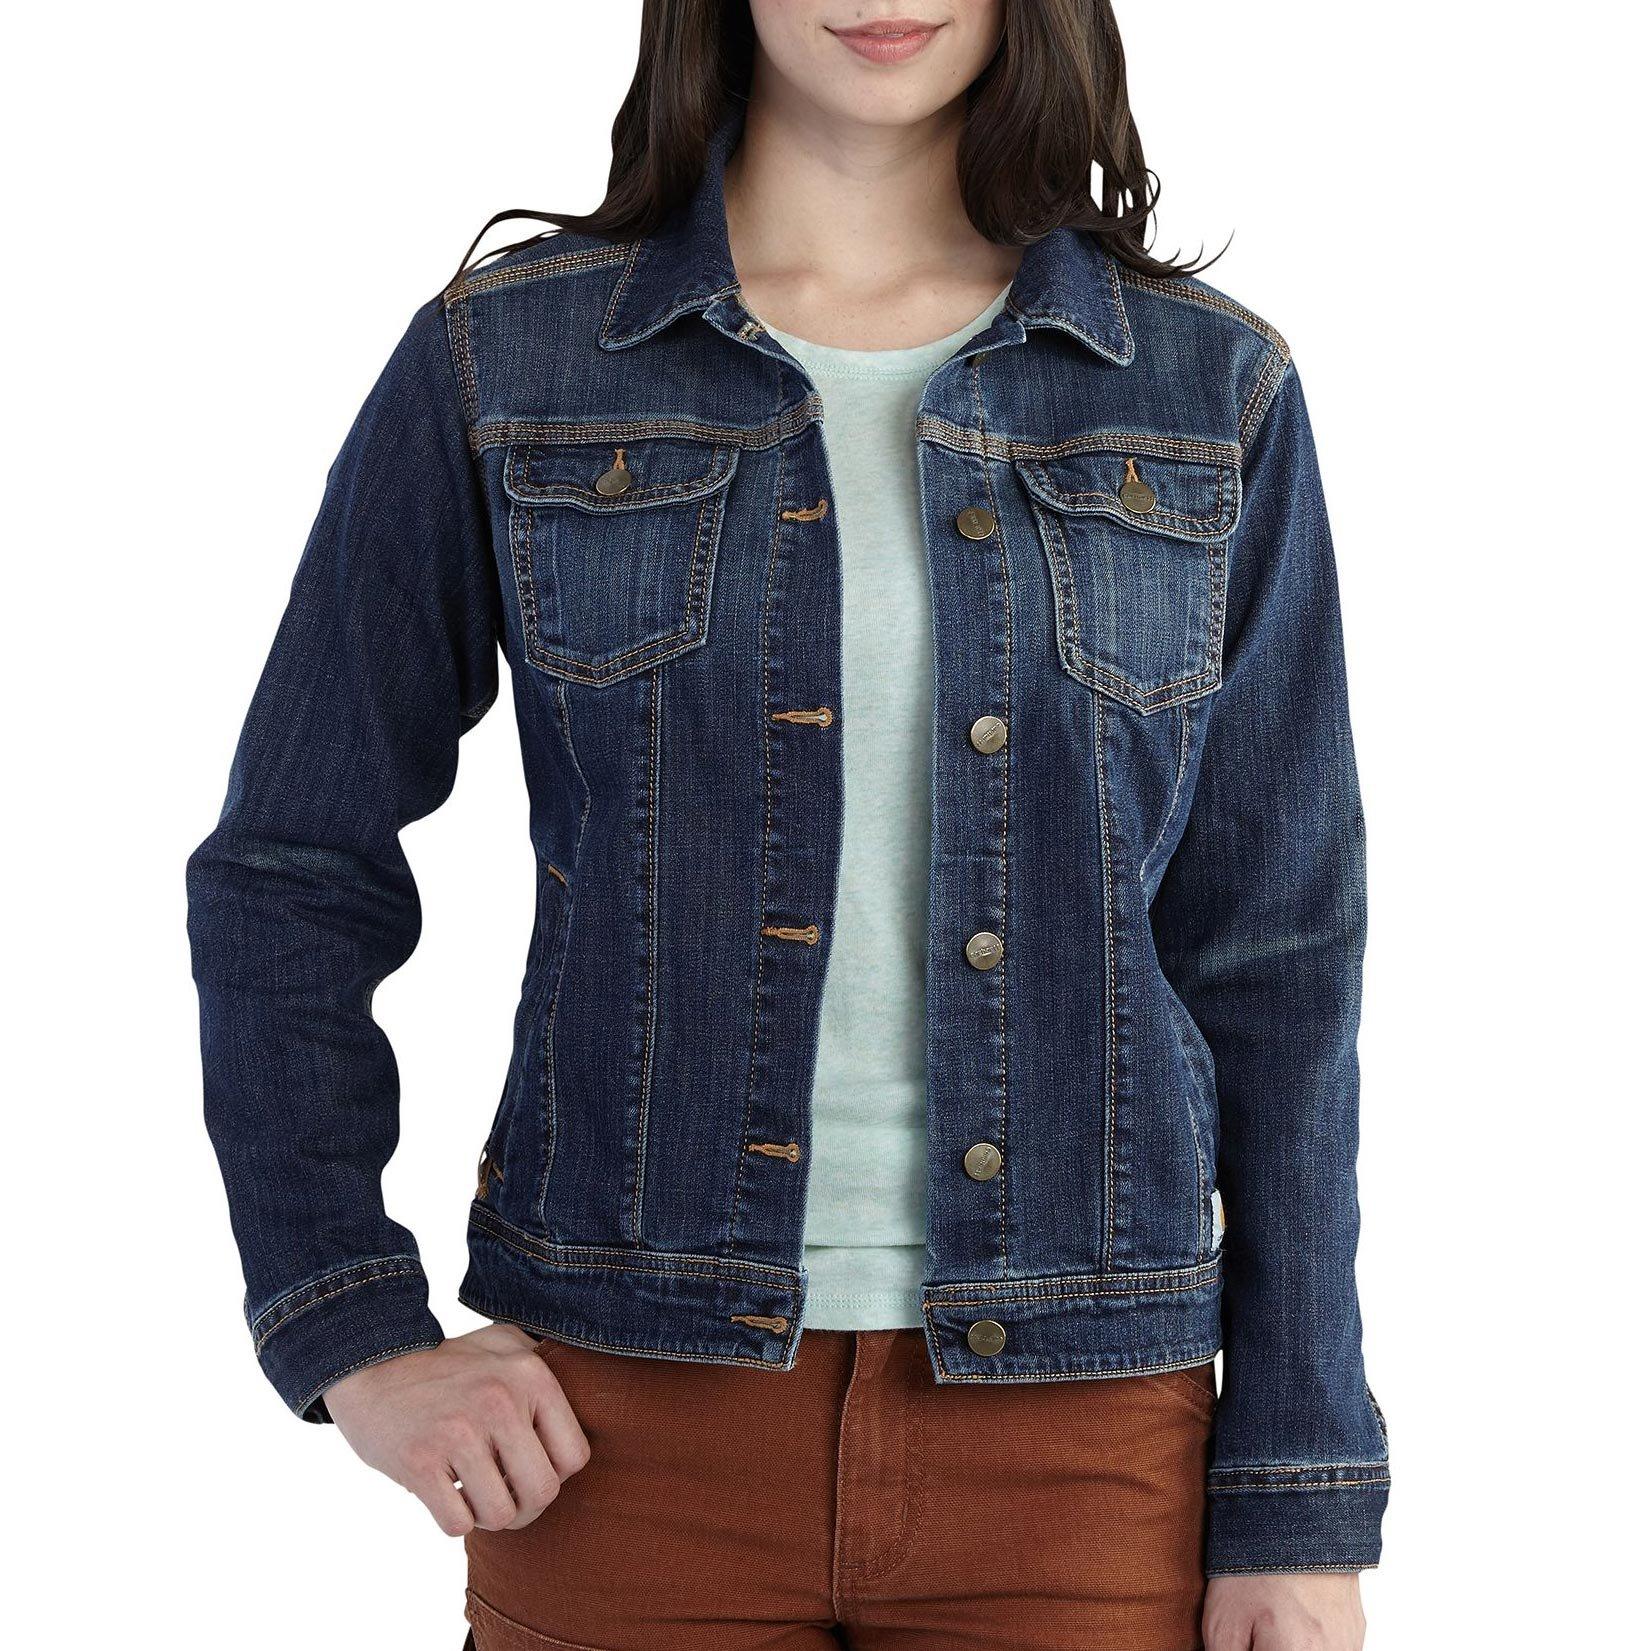 Carhartt Women's Brewster Denim Jacket, Timeworn Indigo, Small